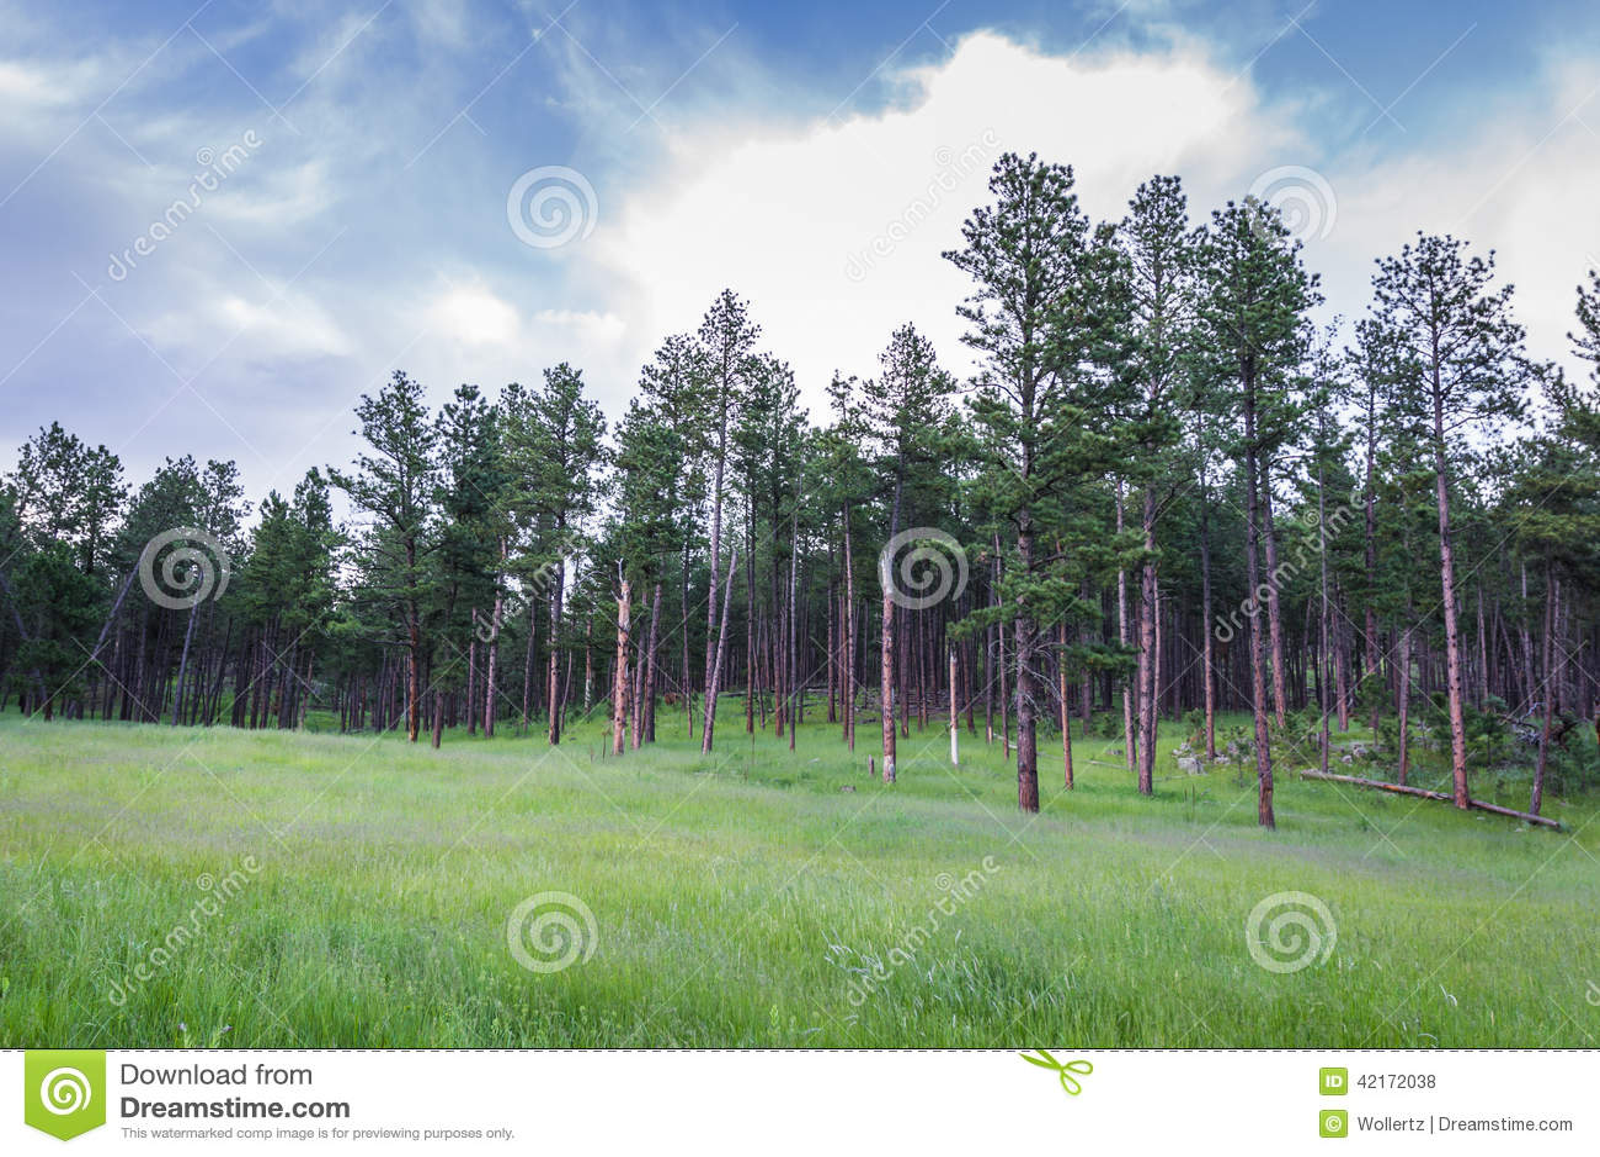 Pine trees in South Dakota